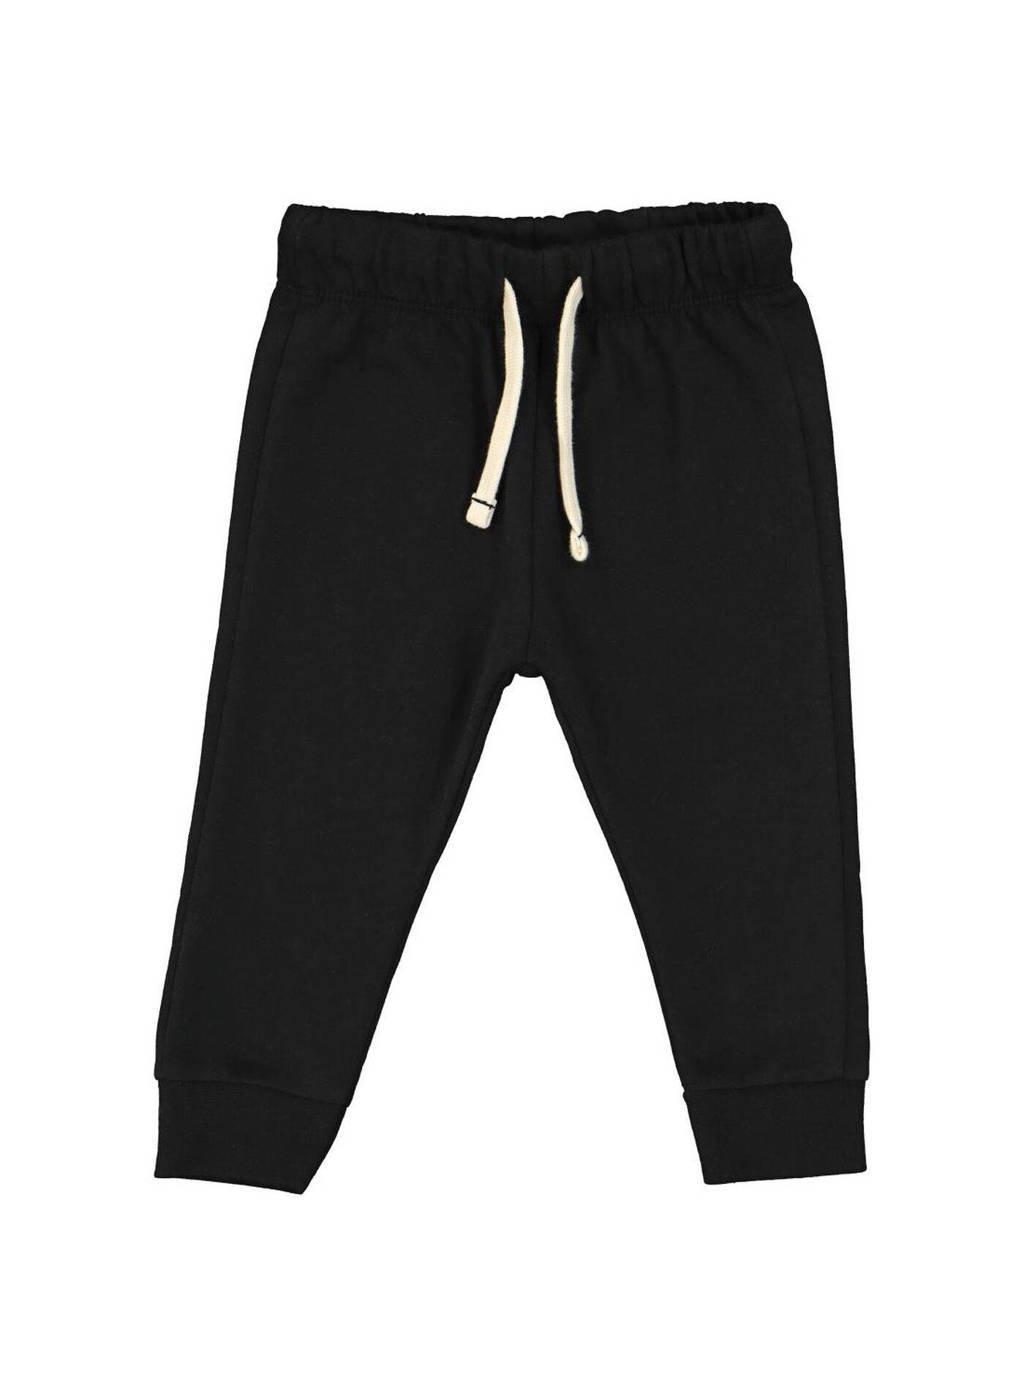 HEMA joggingbroek zwart, Zwart